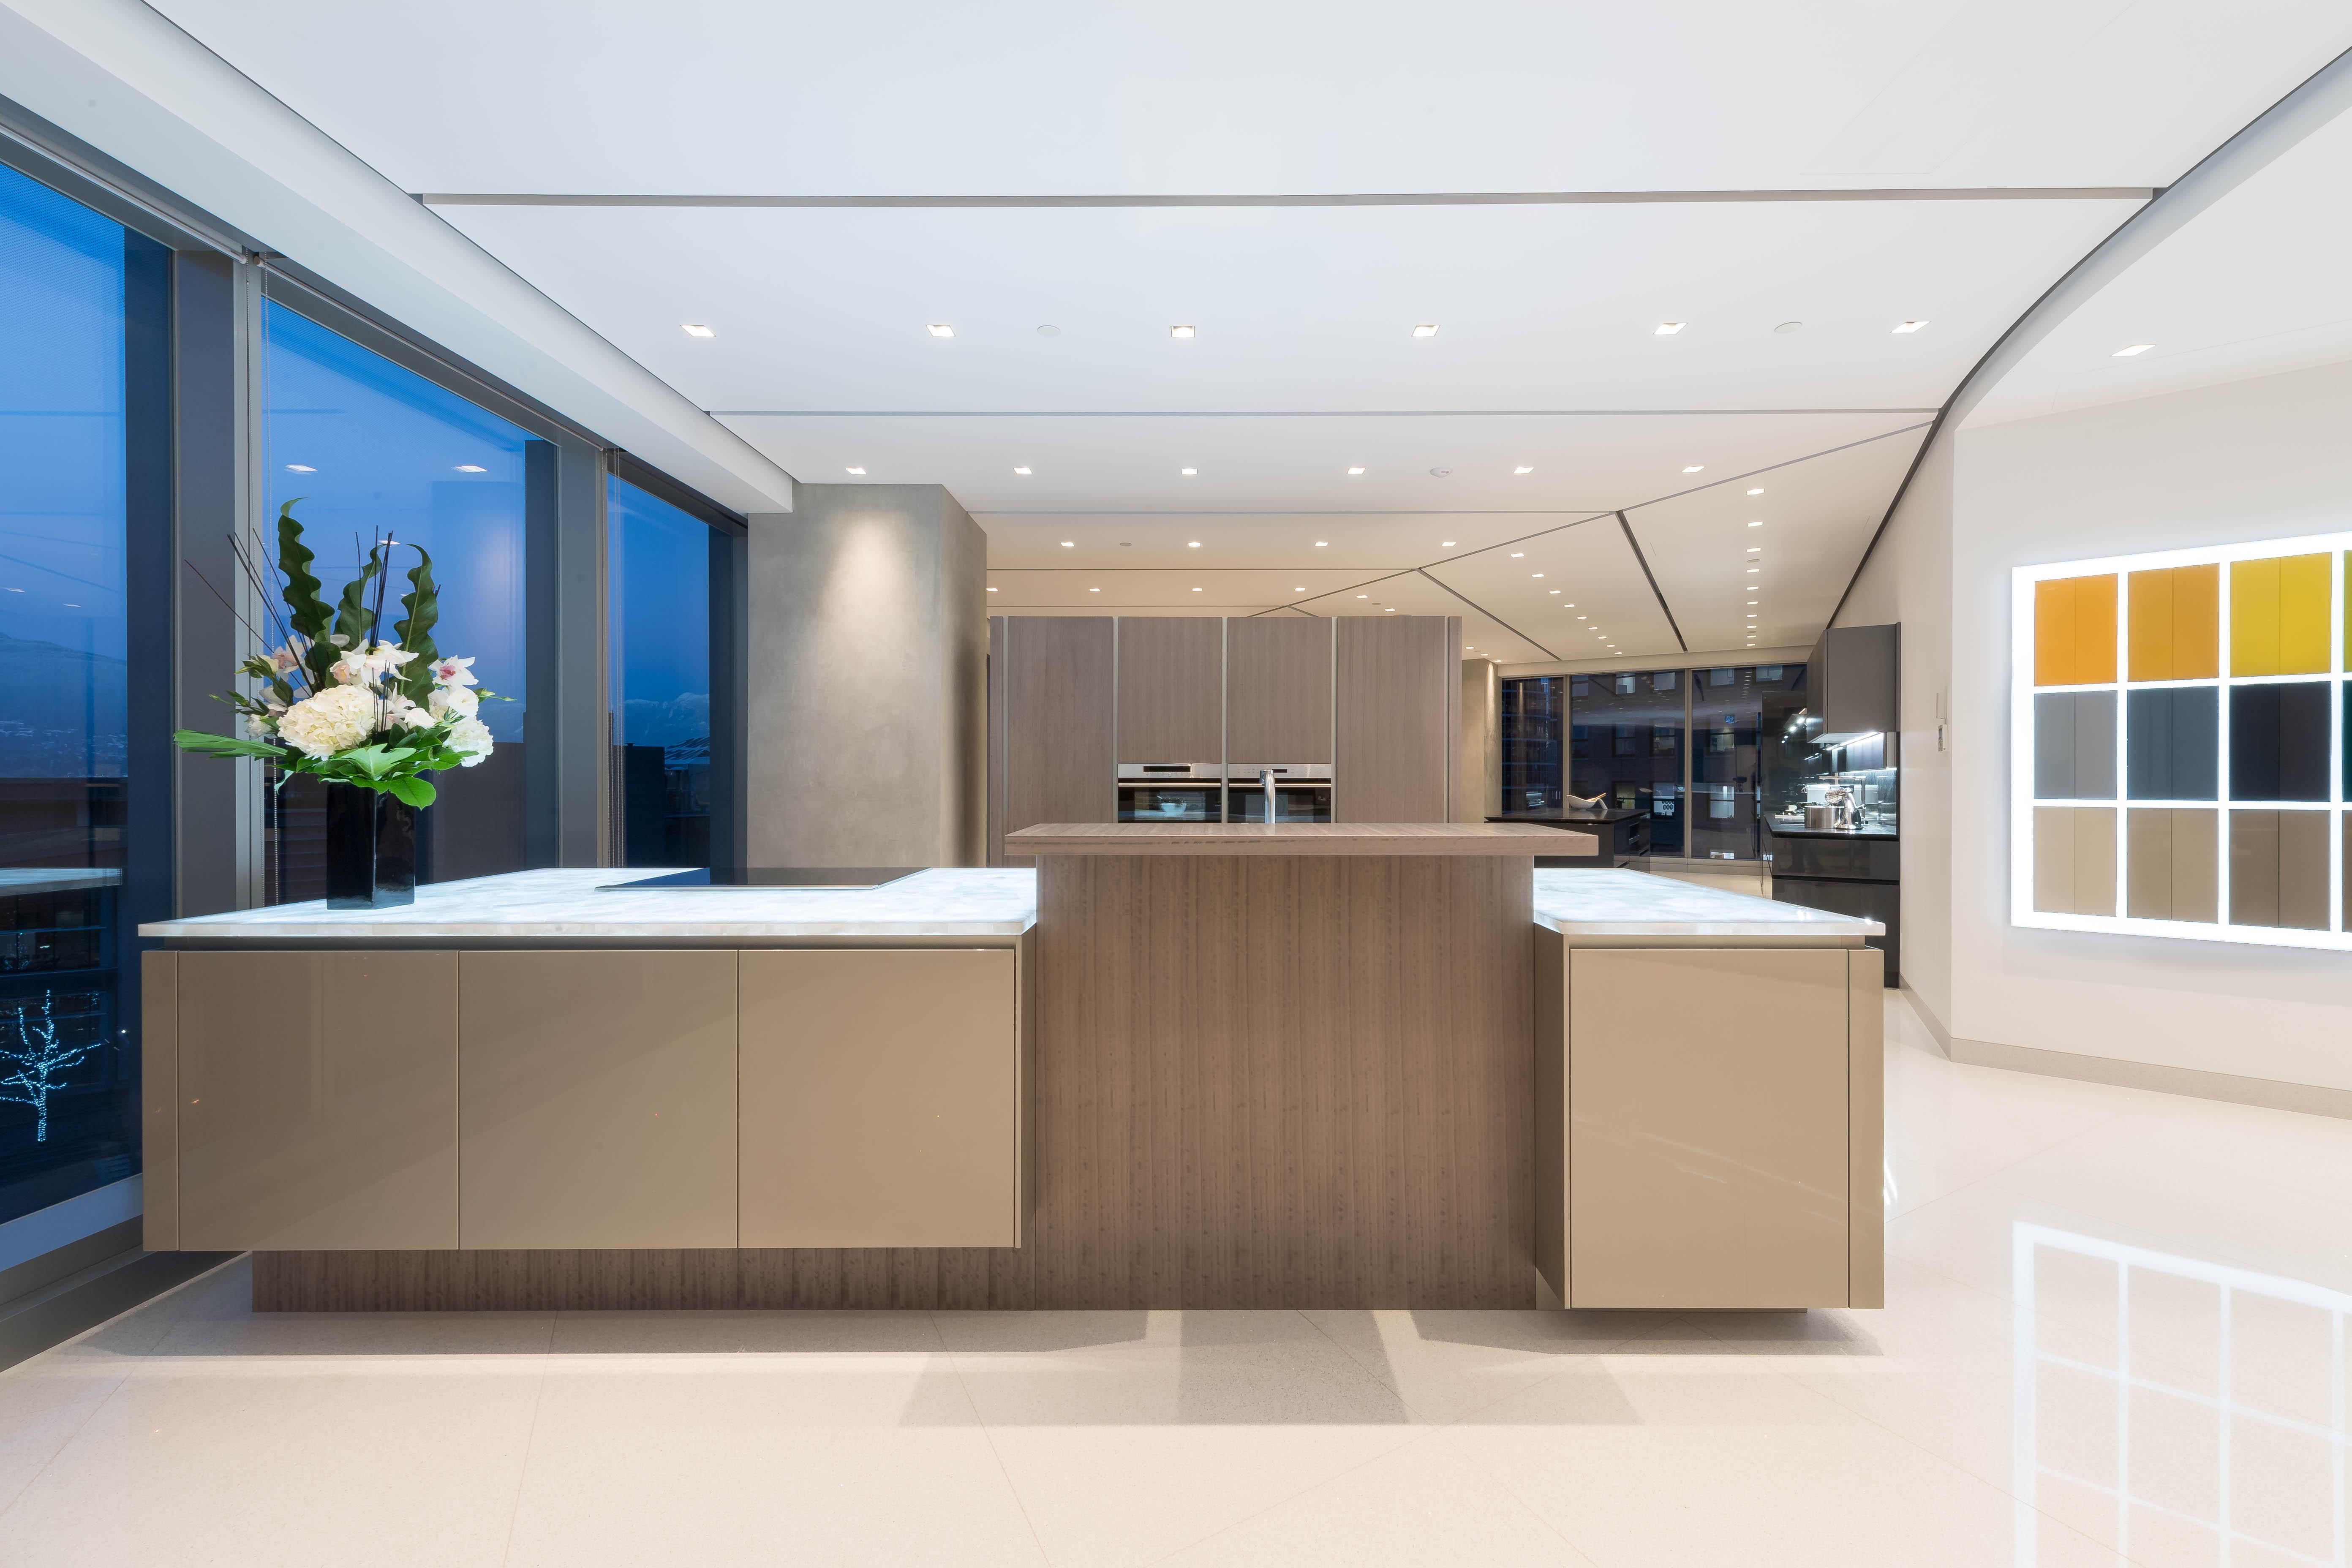 Luxury Kitchen Showroom Studio Snaidero Vancouver Expands to Bigger